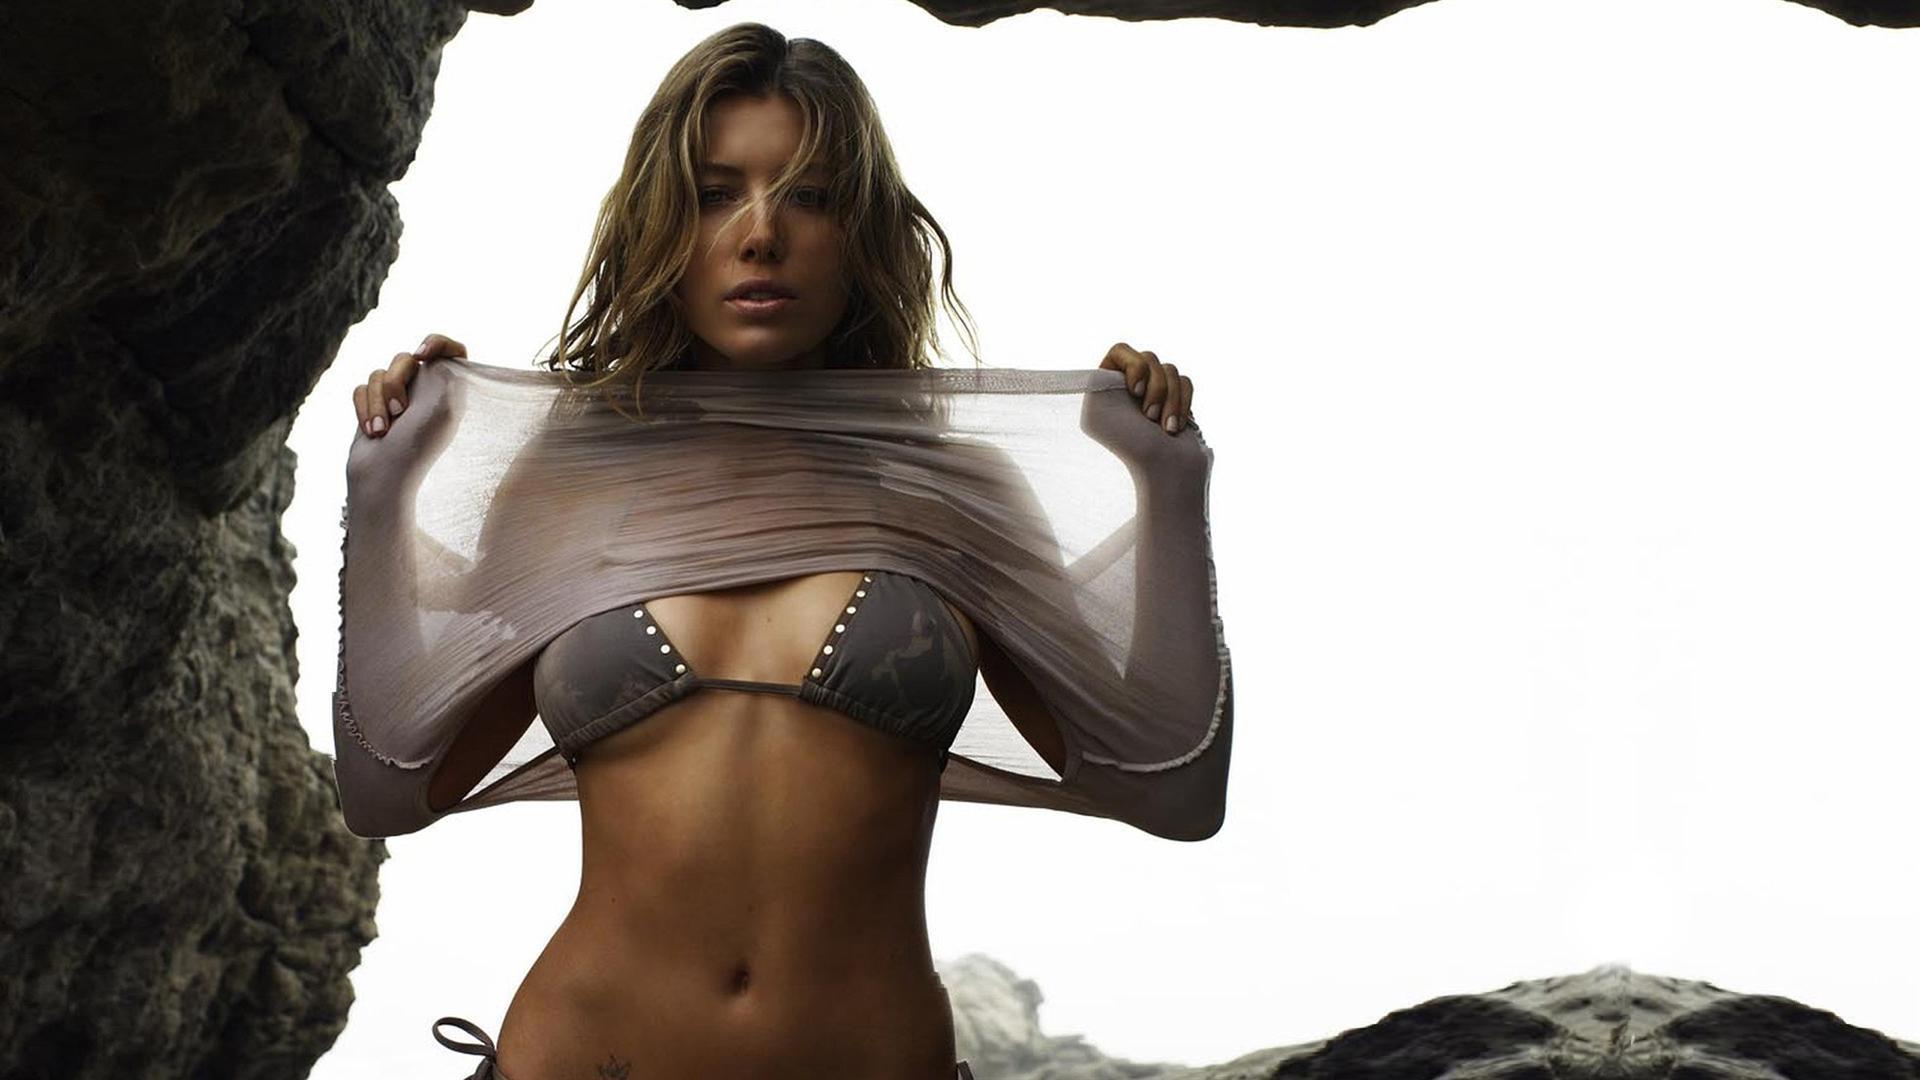 Jessica Biel En Bikini photo 2